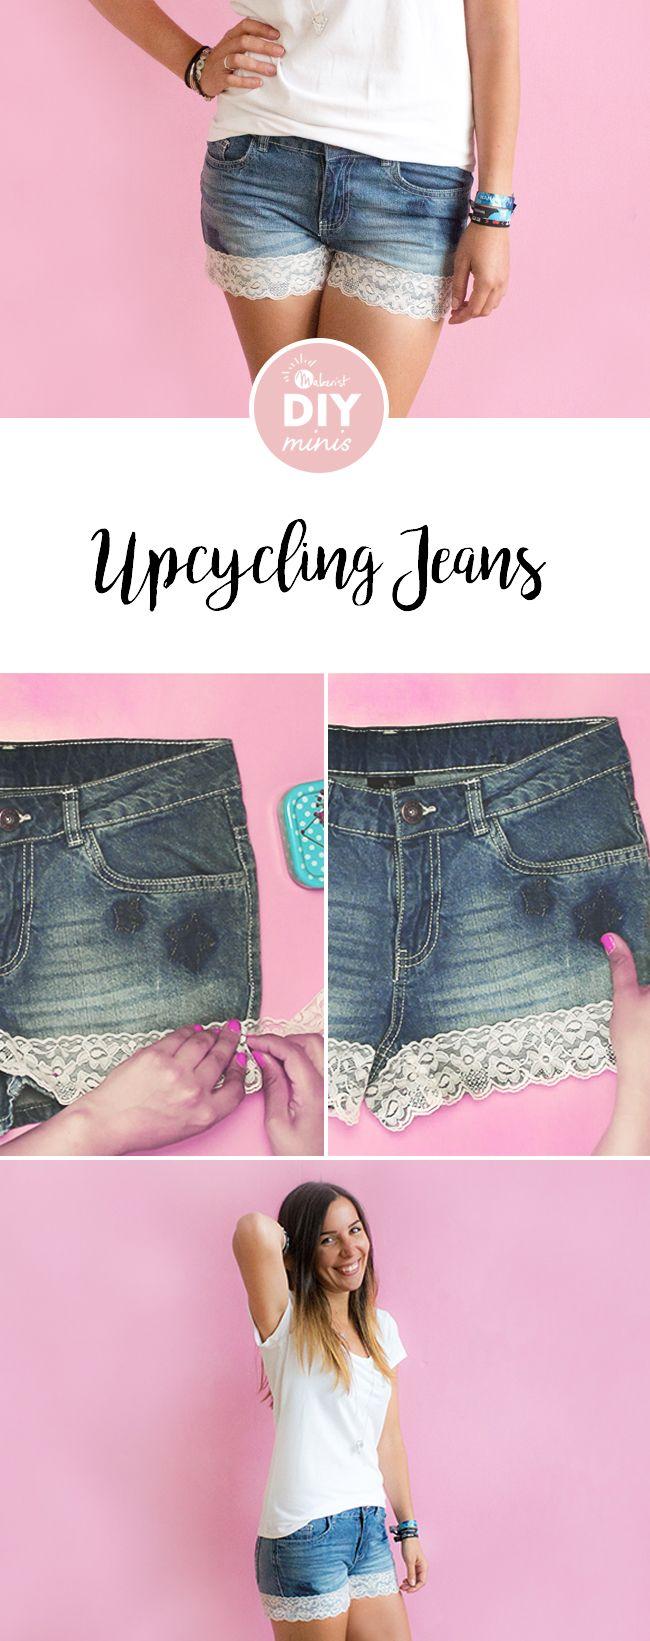 Jeans Shorts mit Spitze verschönern - Upcycling-Anleitung via Makerist.de